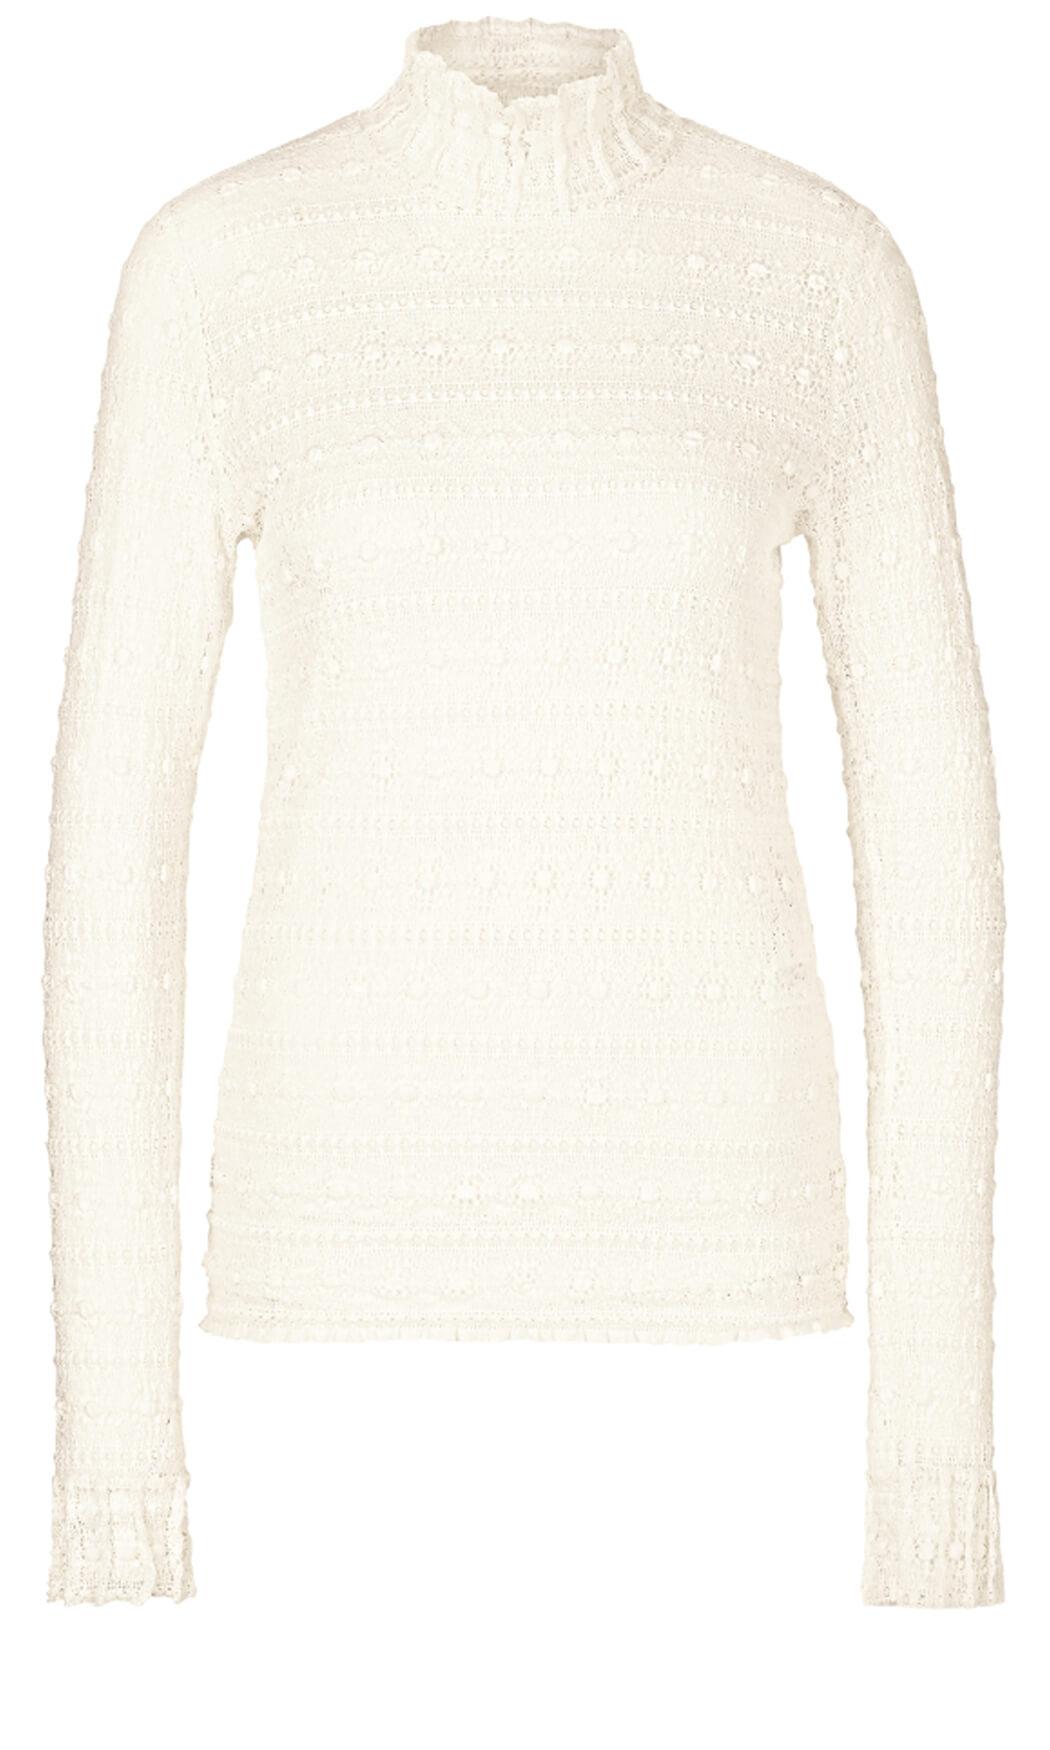 Marccain Dames Kanten blouse wit